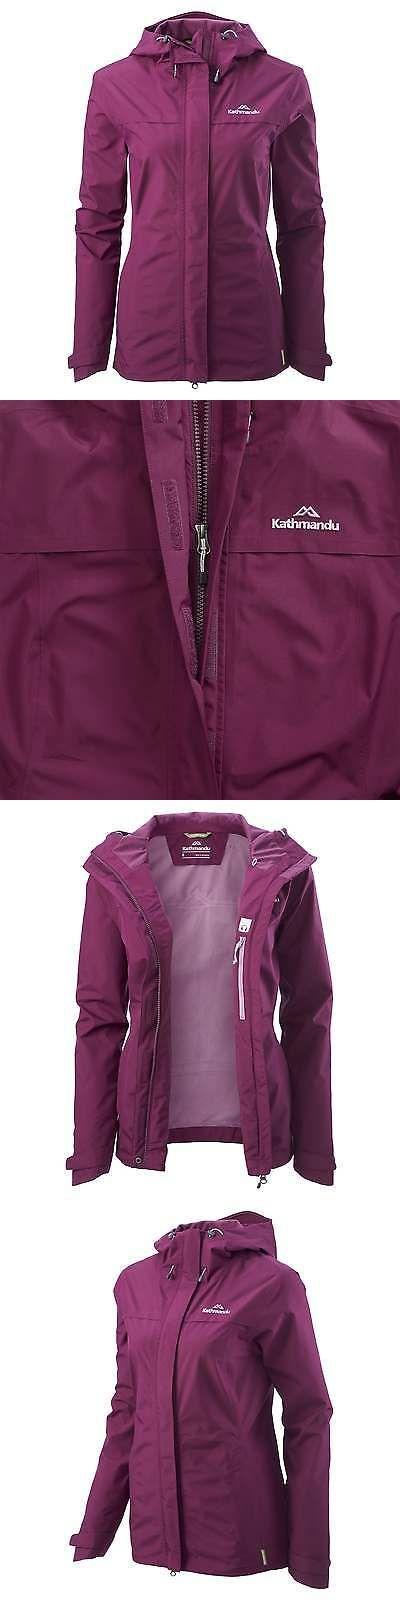 Coats and Jackets 181365: Kathmandu Bealey Womens Gore-Tex Windproof Waterproof Outdoor Rain Jacket Purple -> BUY IT NOW ONLY: $199.98 on eBay!